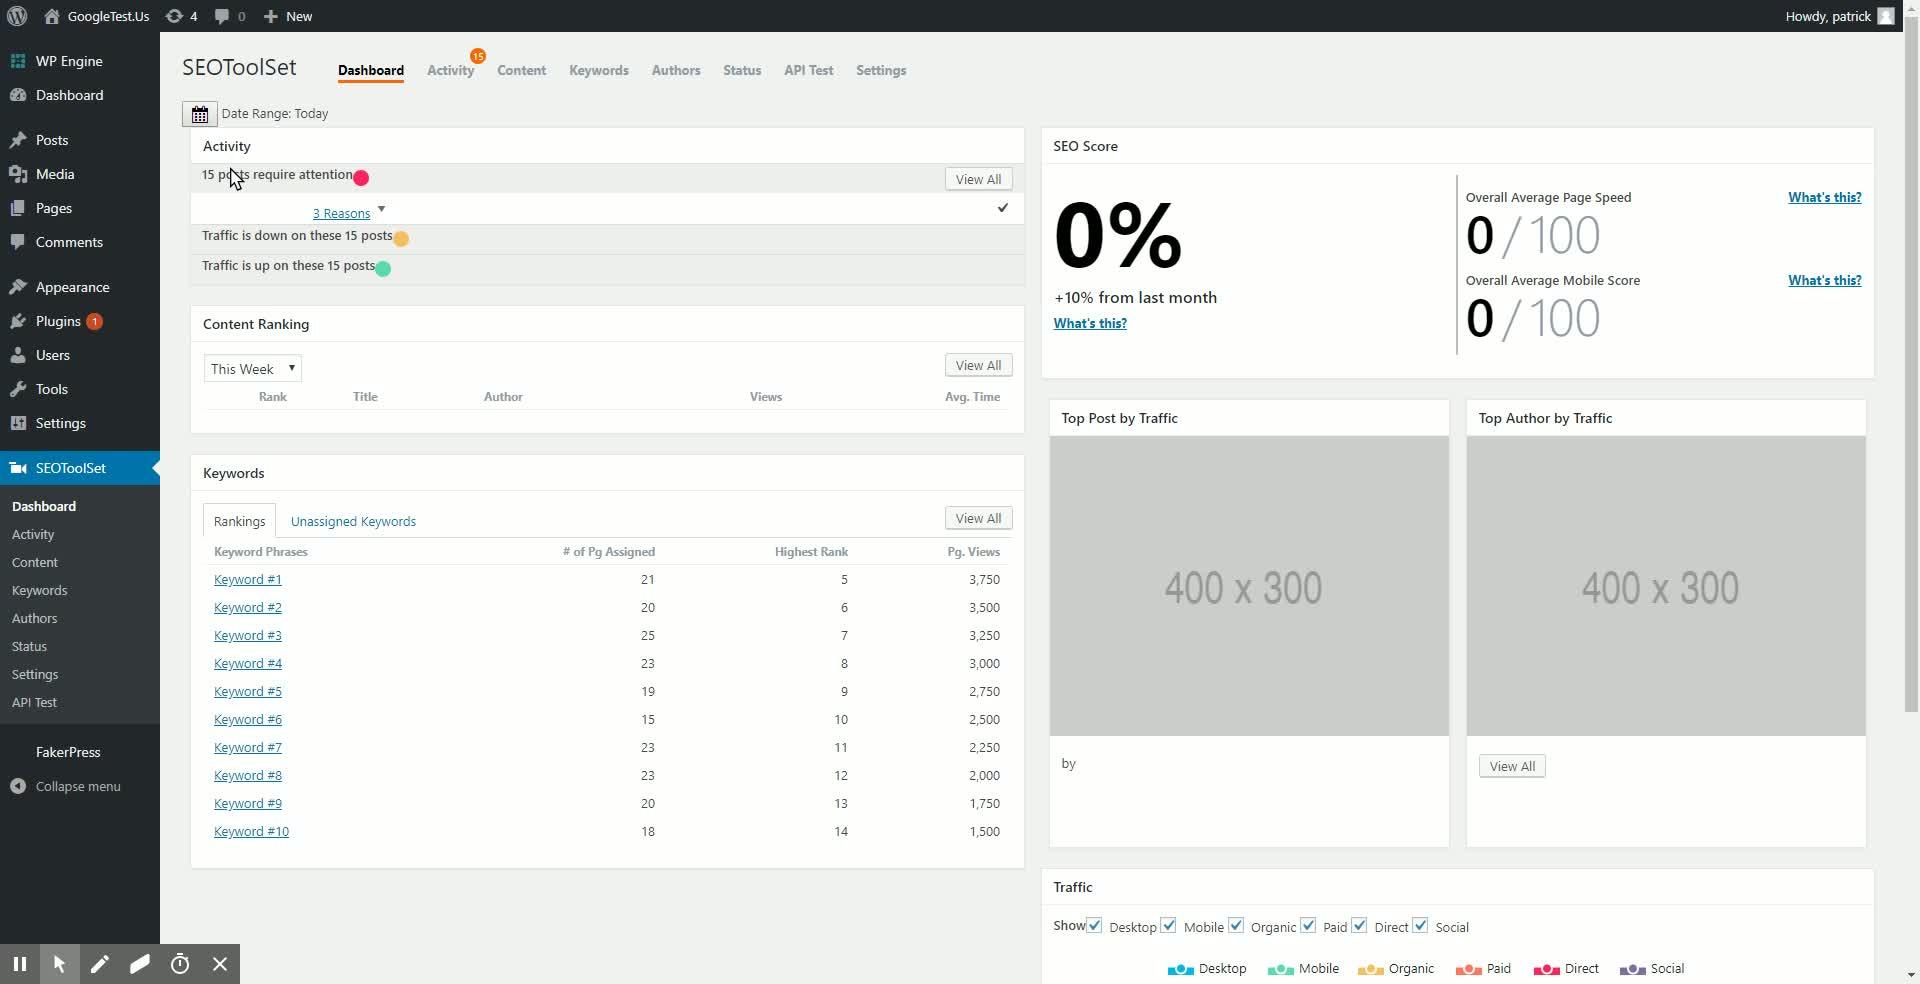 SEOToolSet Dashboard ‹ GoogleTest.Us — WordPress GIFs